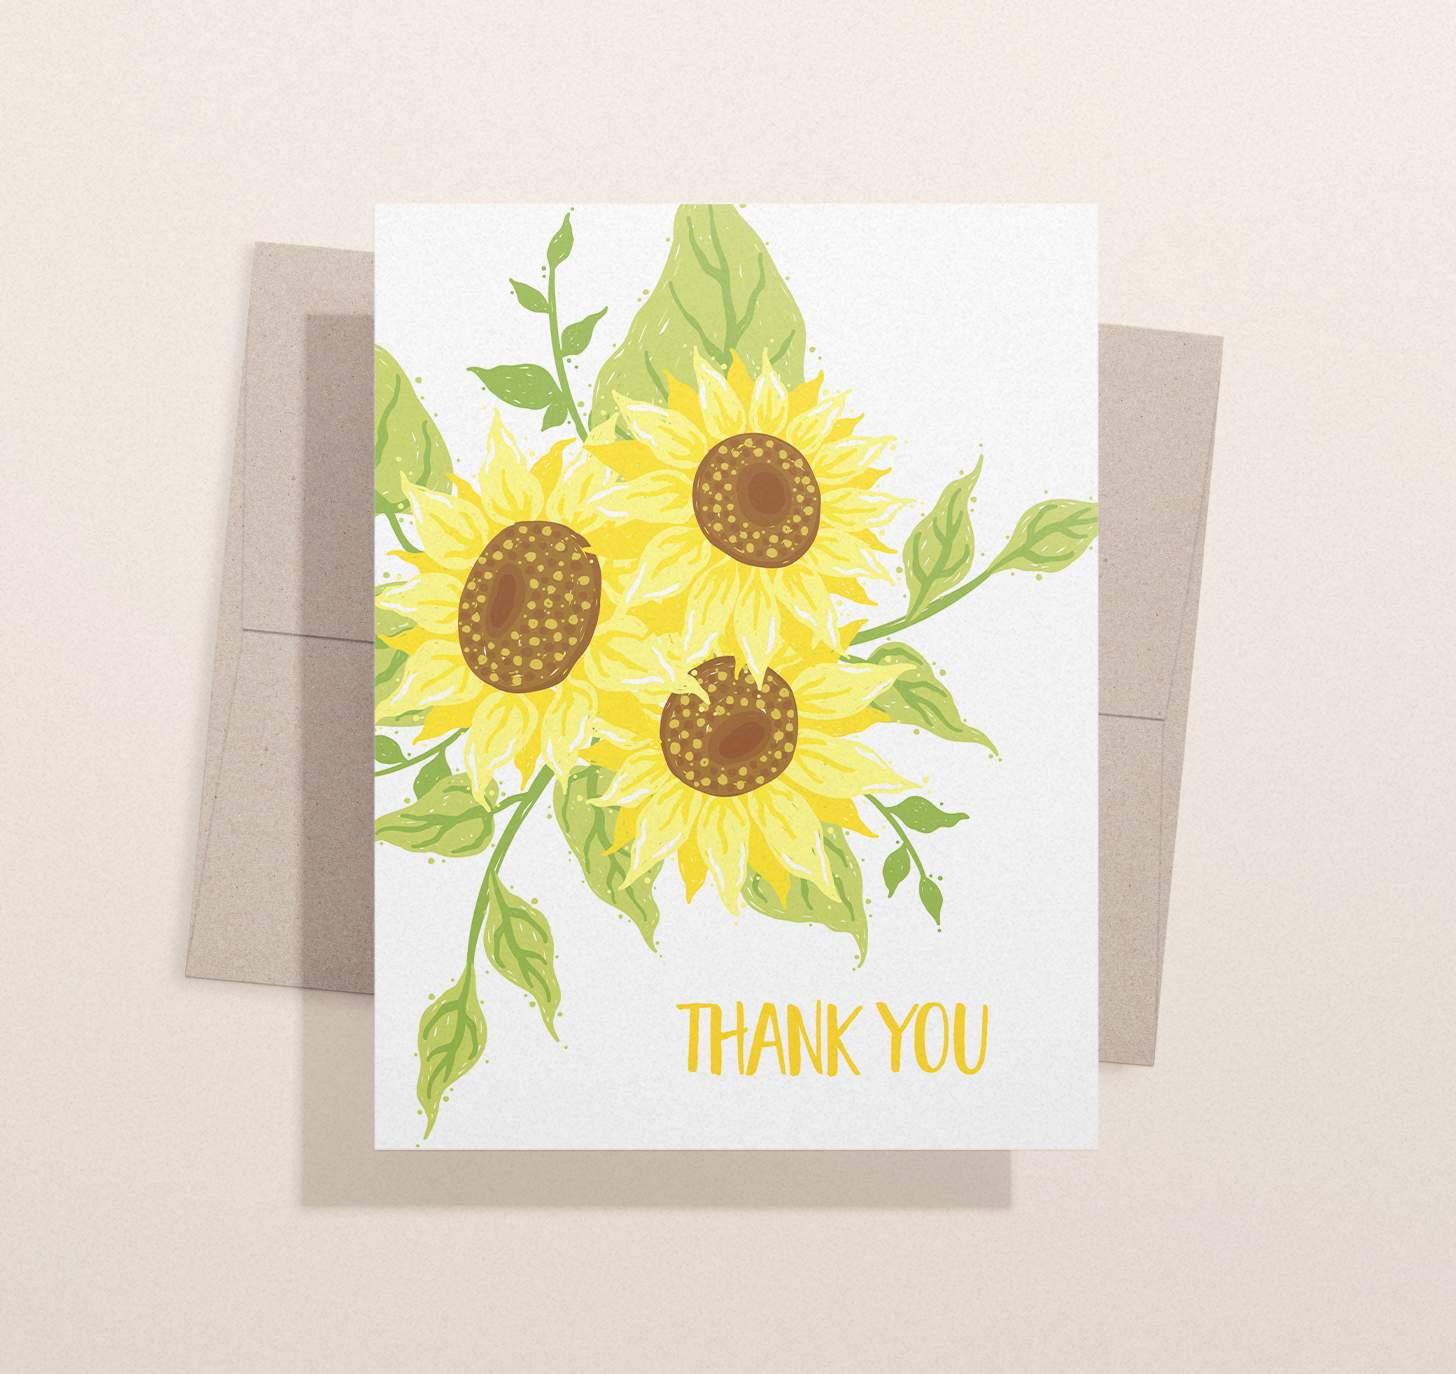 Three yellow sunflowers design with envelope